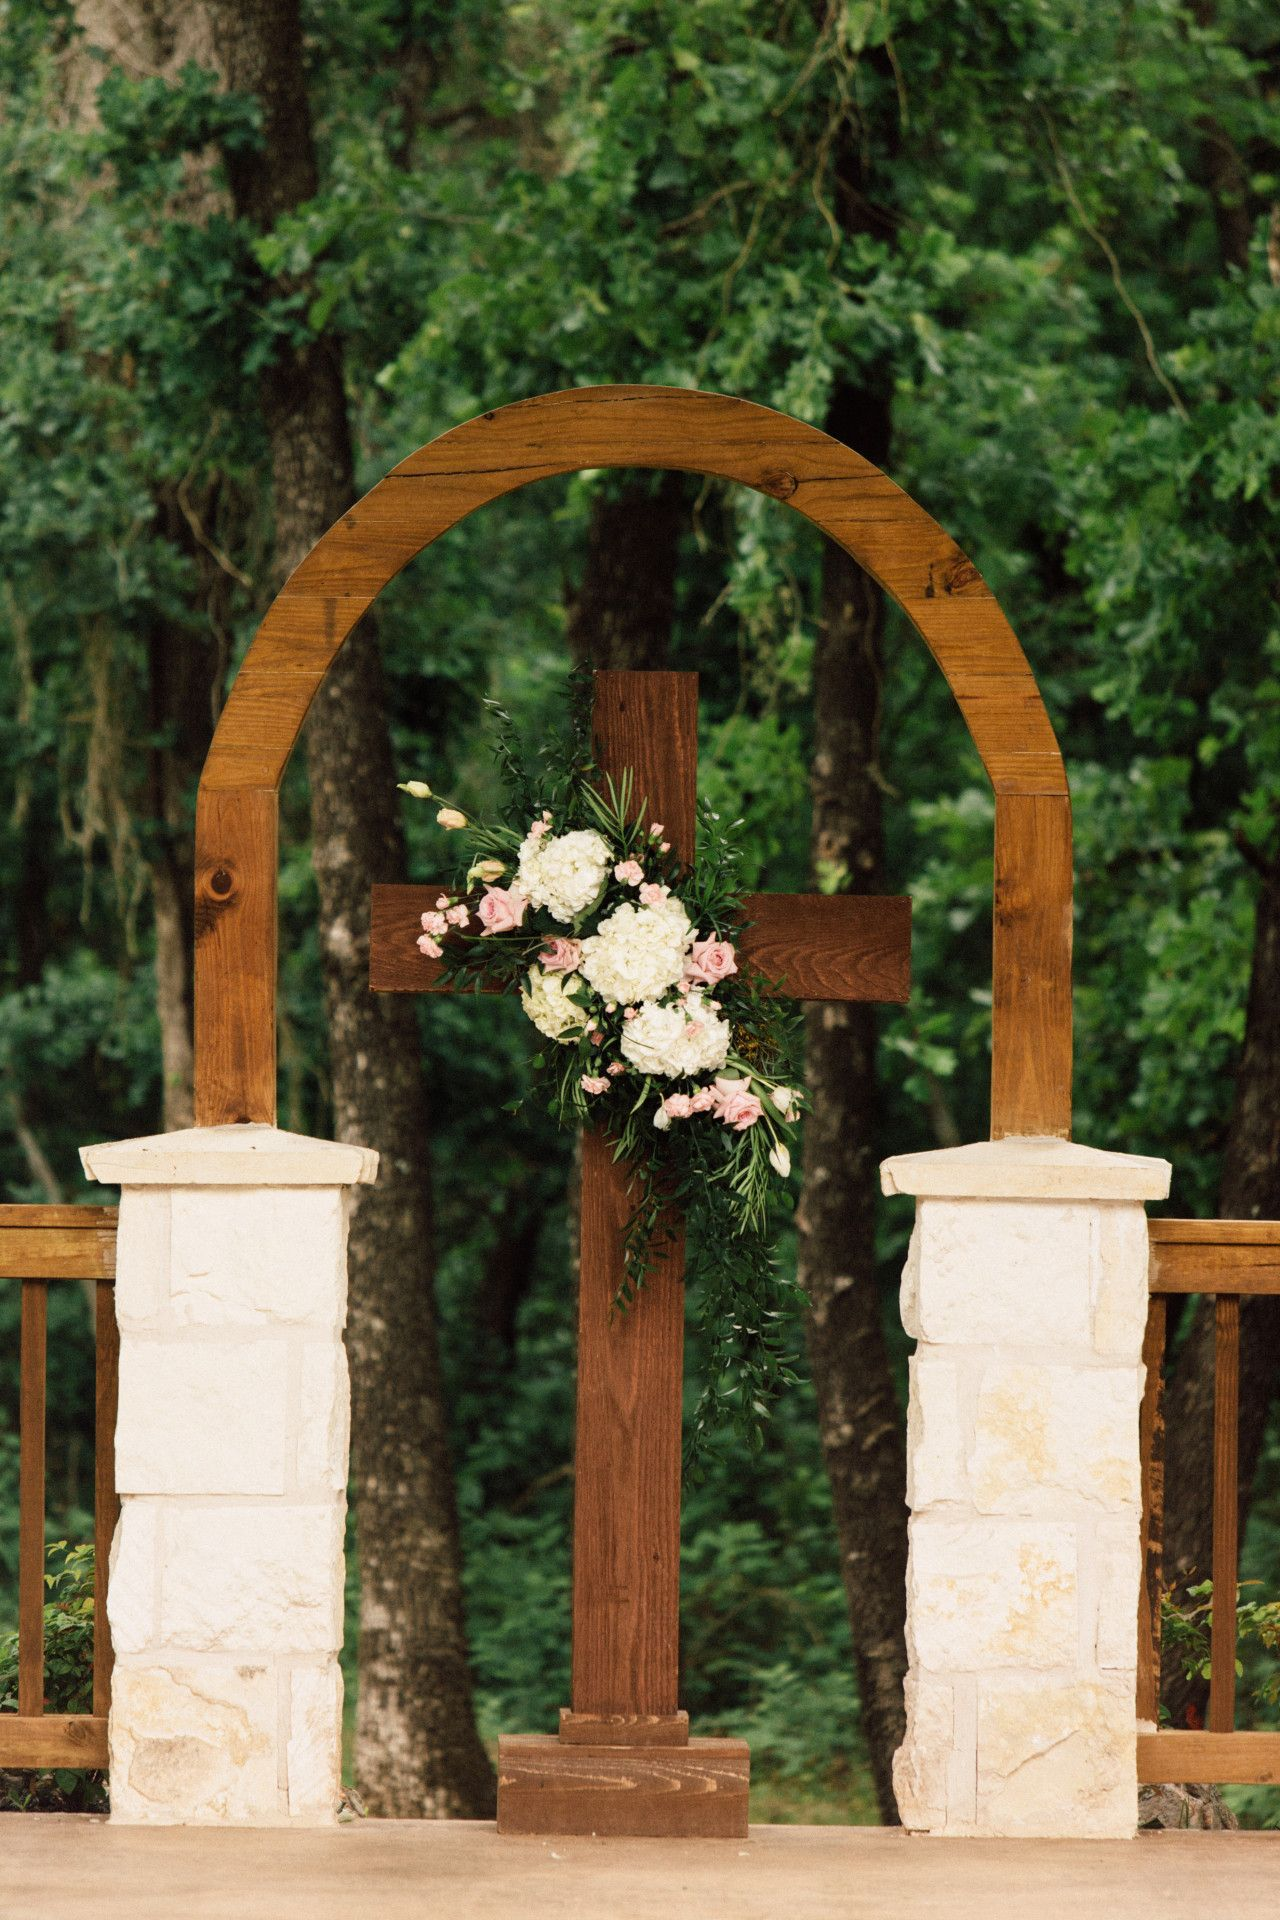 Wedding Venue Norman Oklahoma Wedding Arches Outdoors Vintage